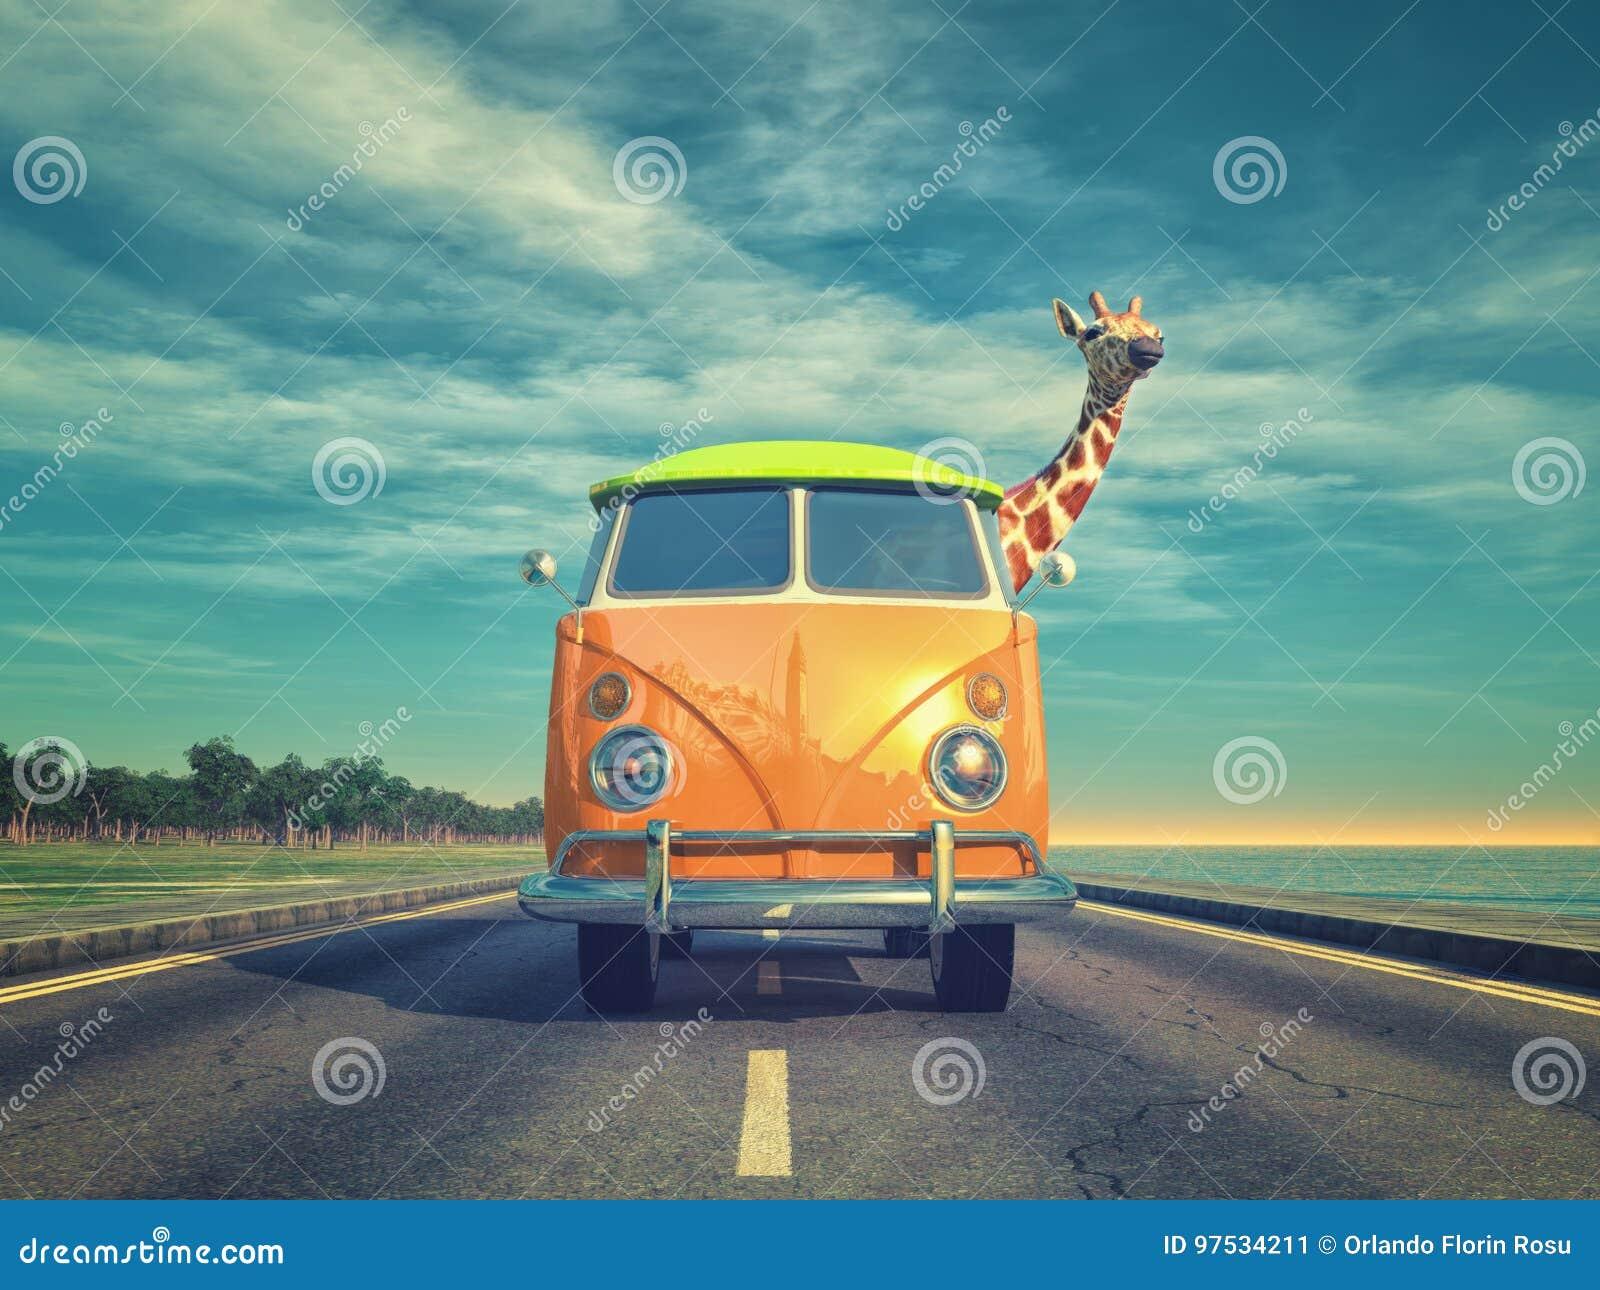 Girafa pelo carro na estrada